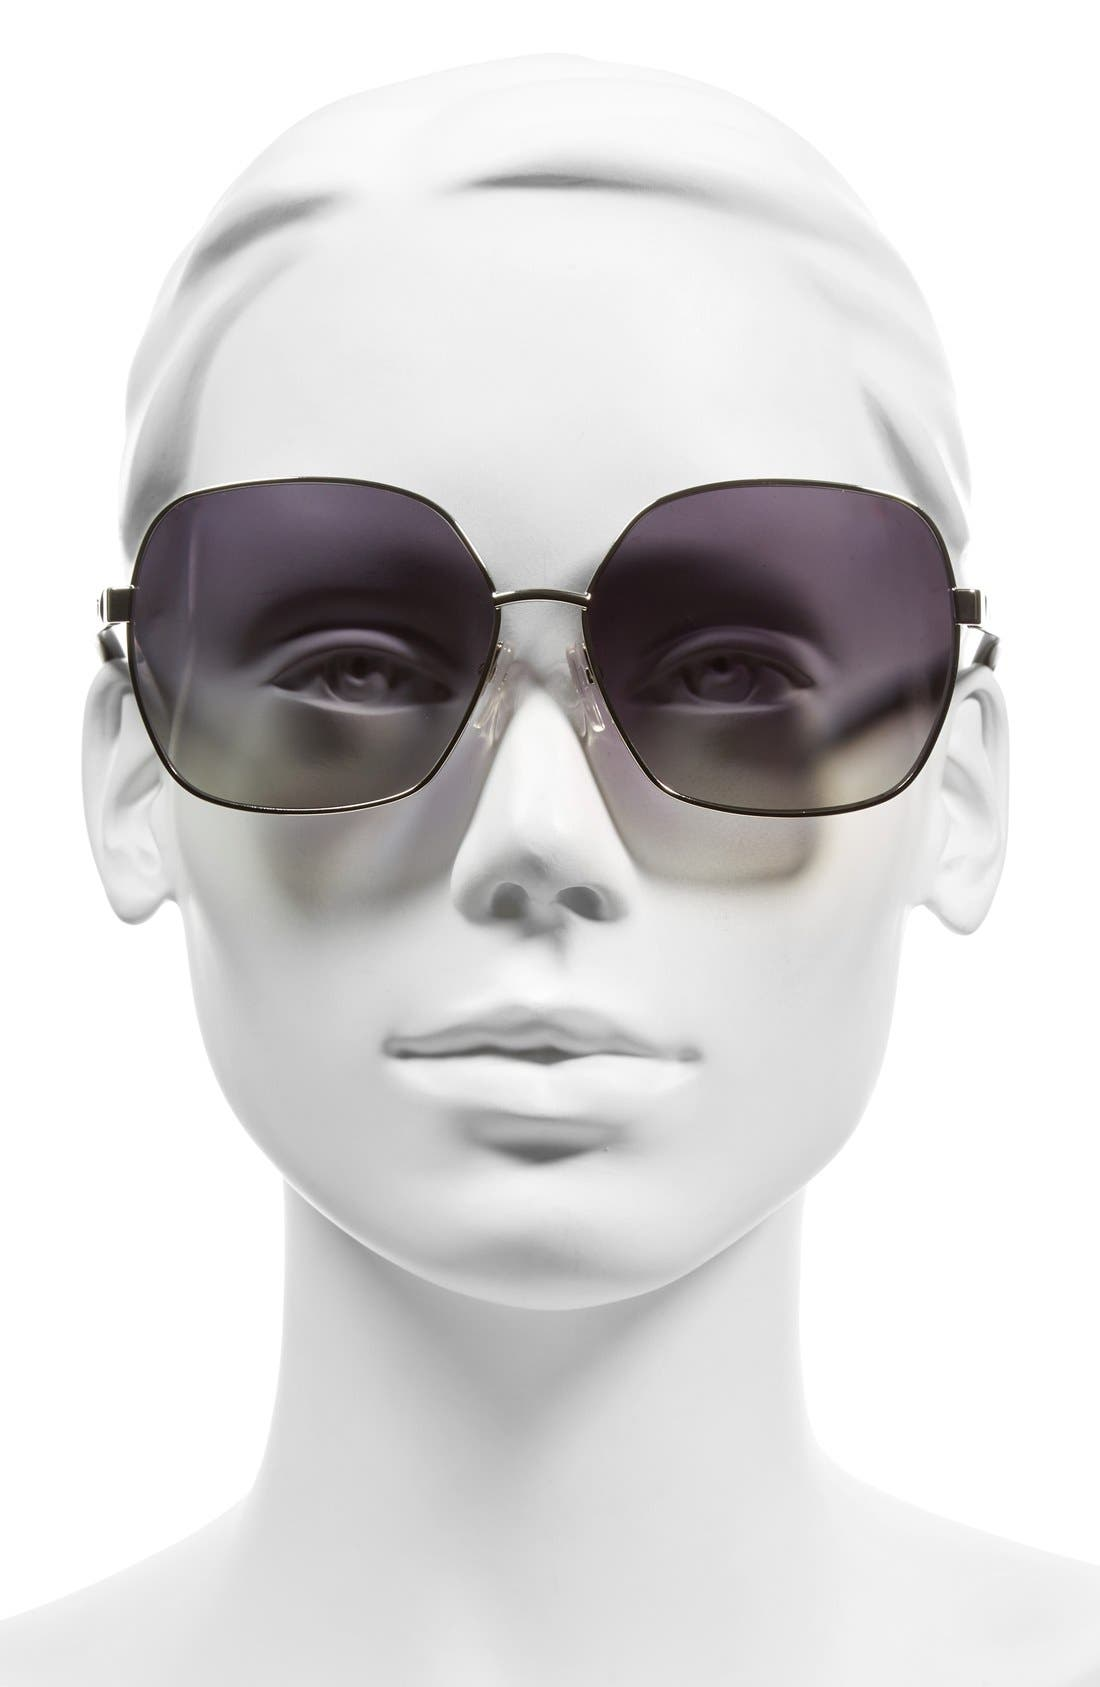 61mm Polarized Oversized Sunglasses,                             Alternate thumbnail 2, color,                             Palladium/ Black